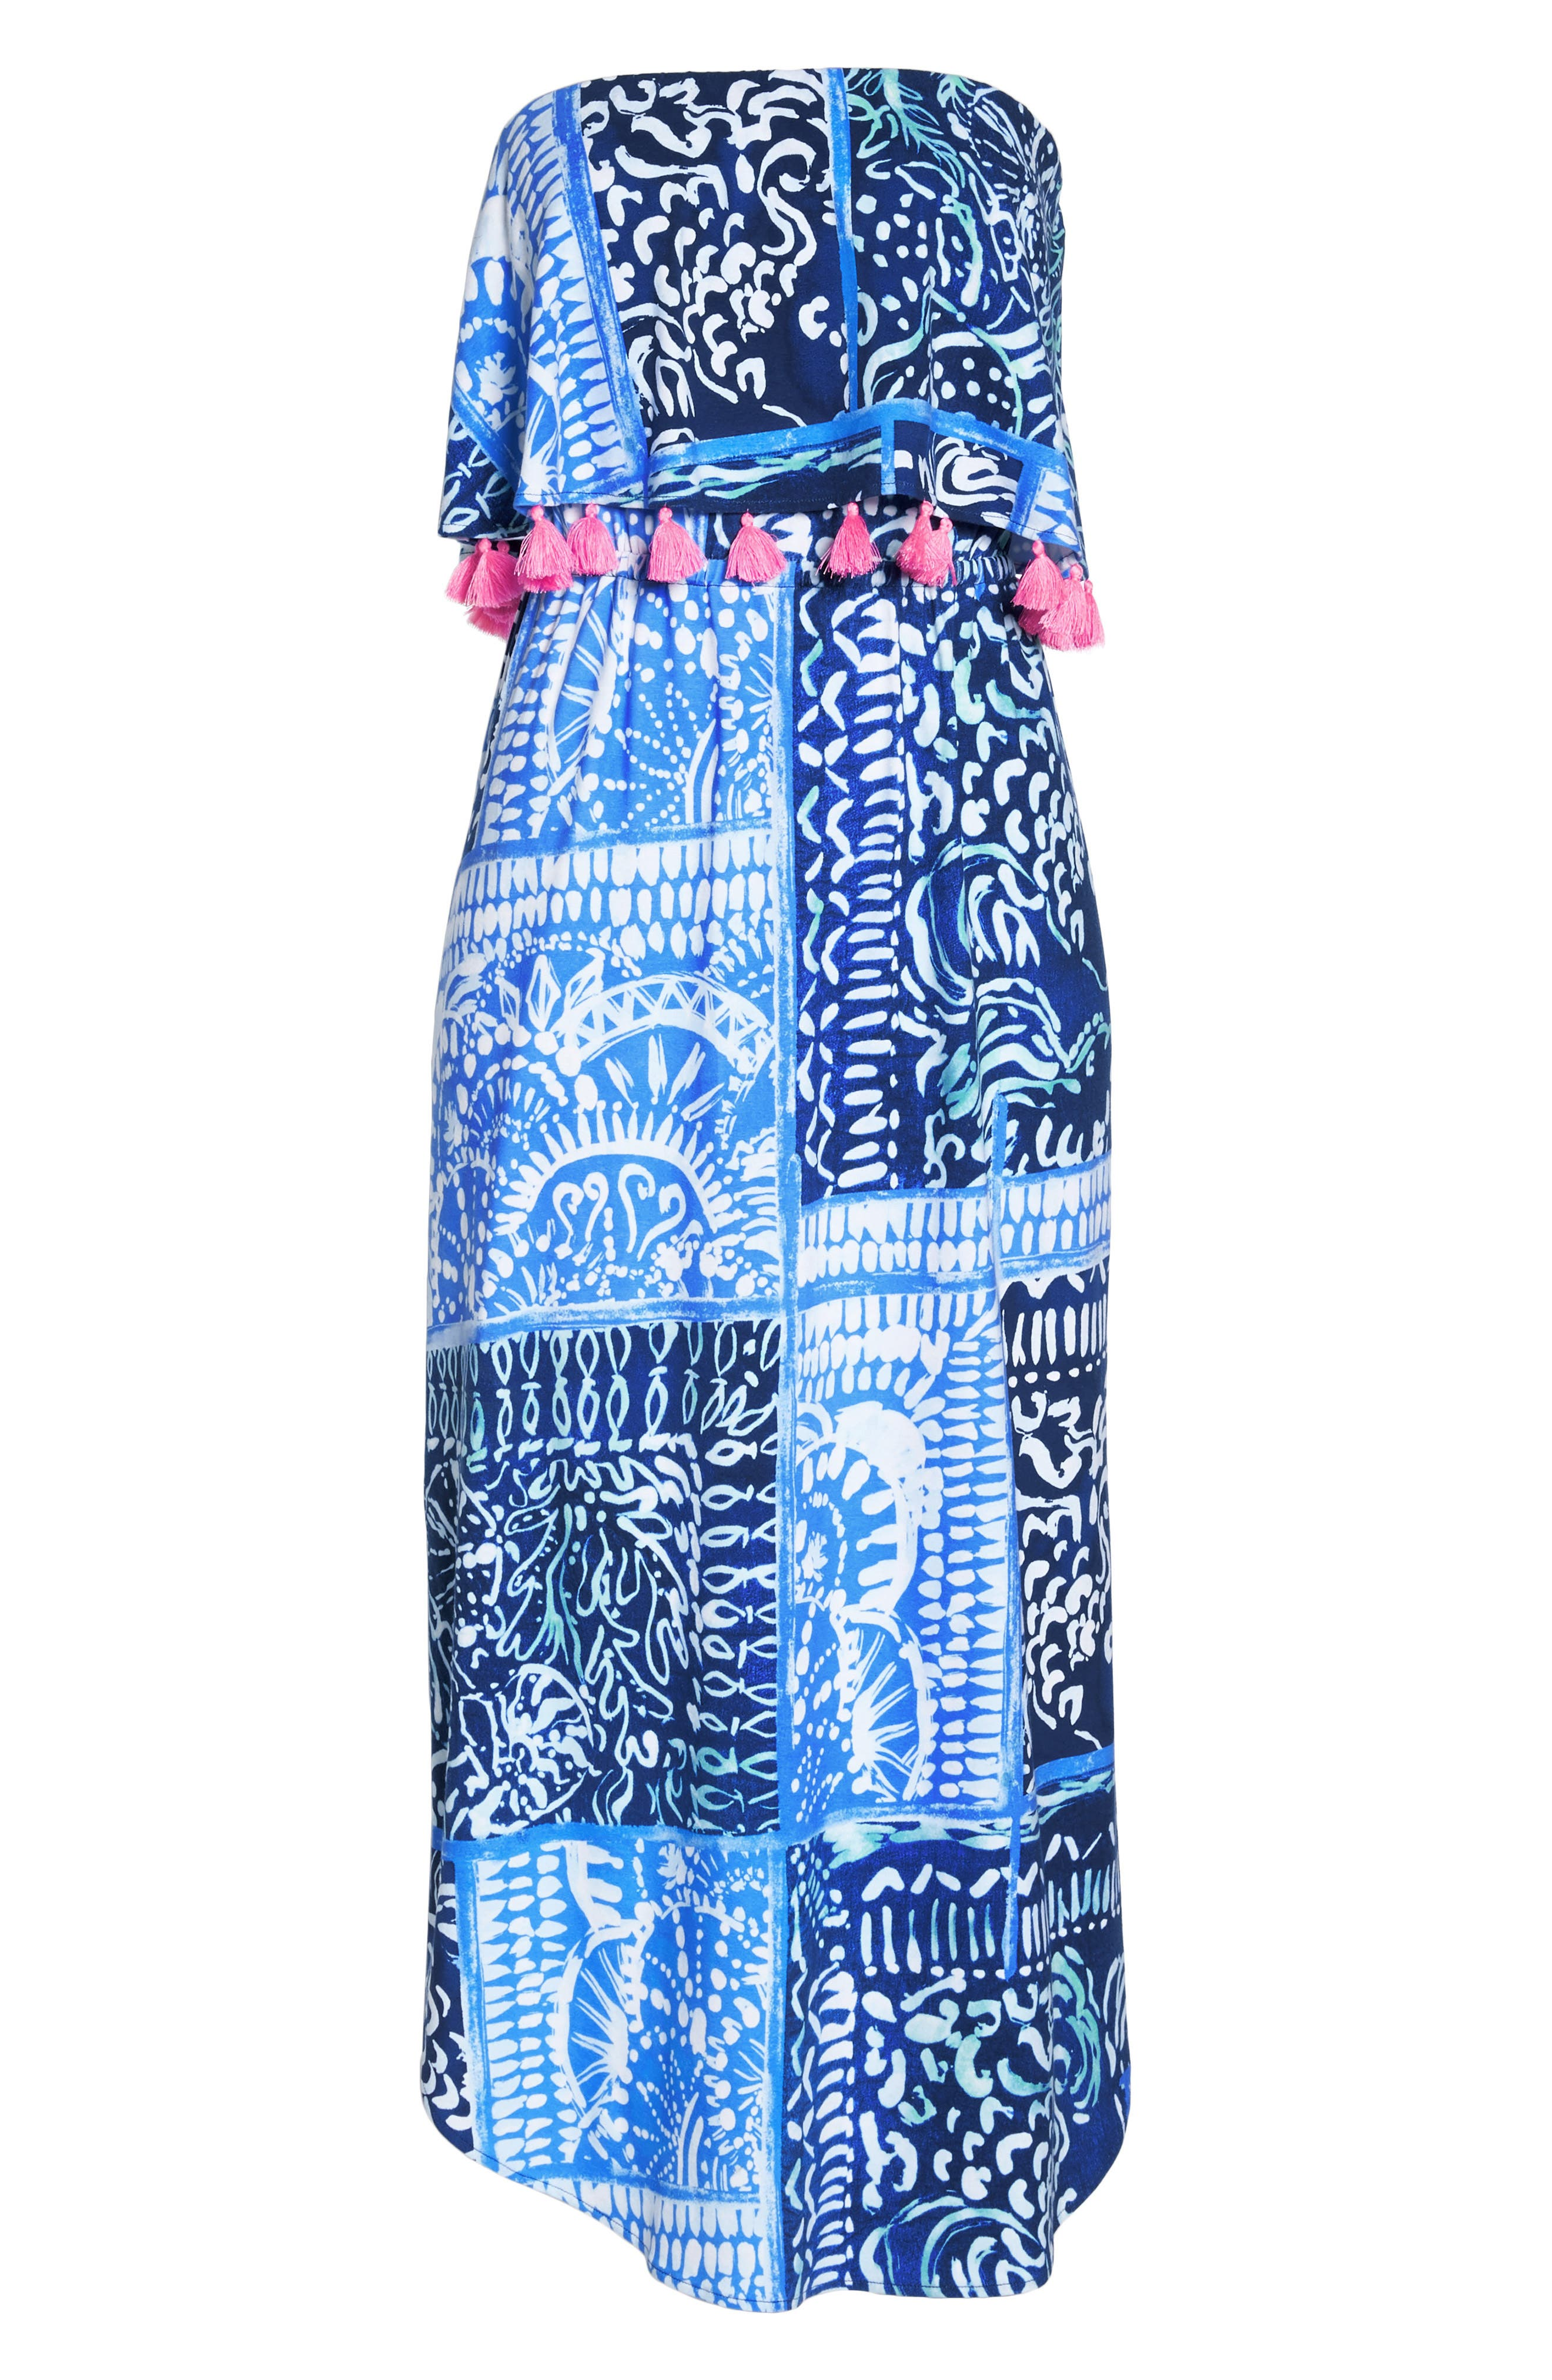 Meridian Strapless Midi Dress,                             Alternate thumbnail 6, color,                             Deep Indigo Leid Back